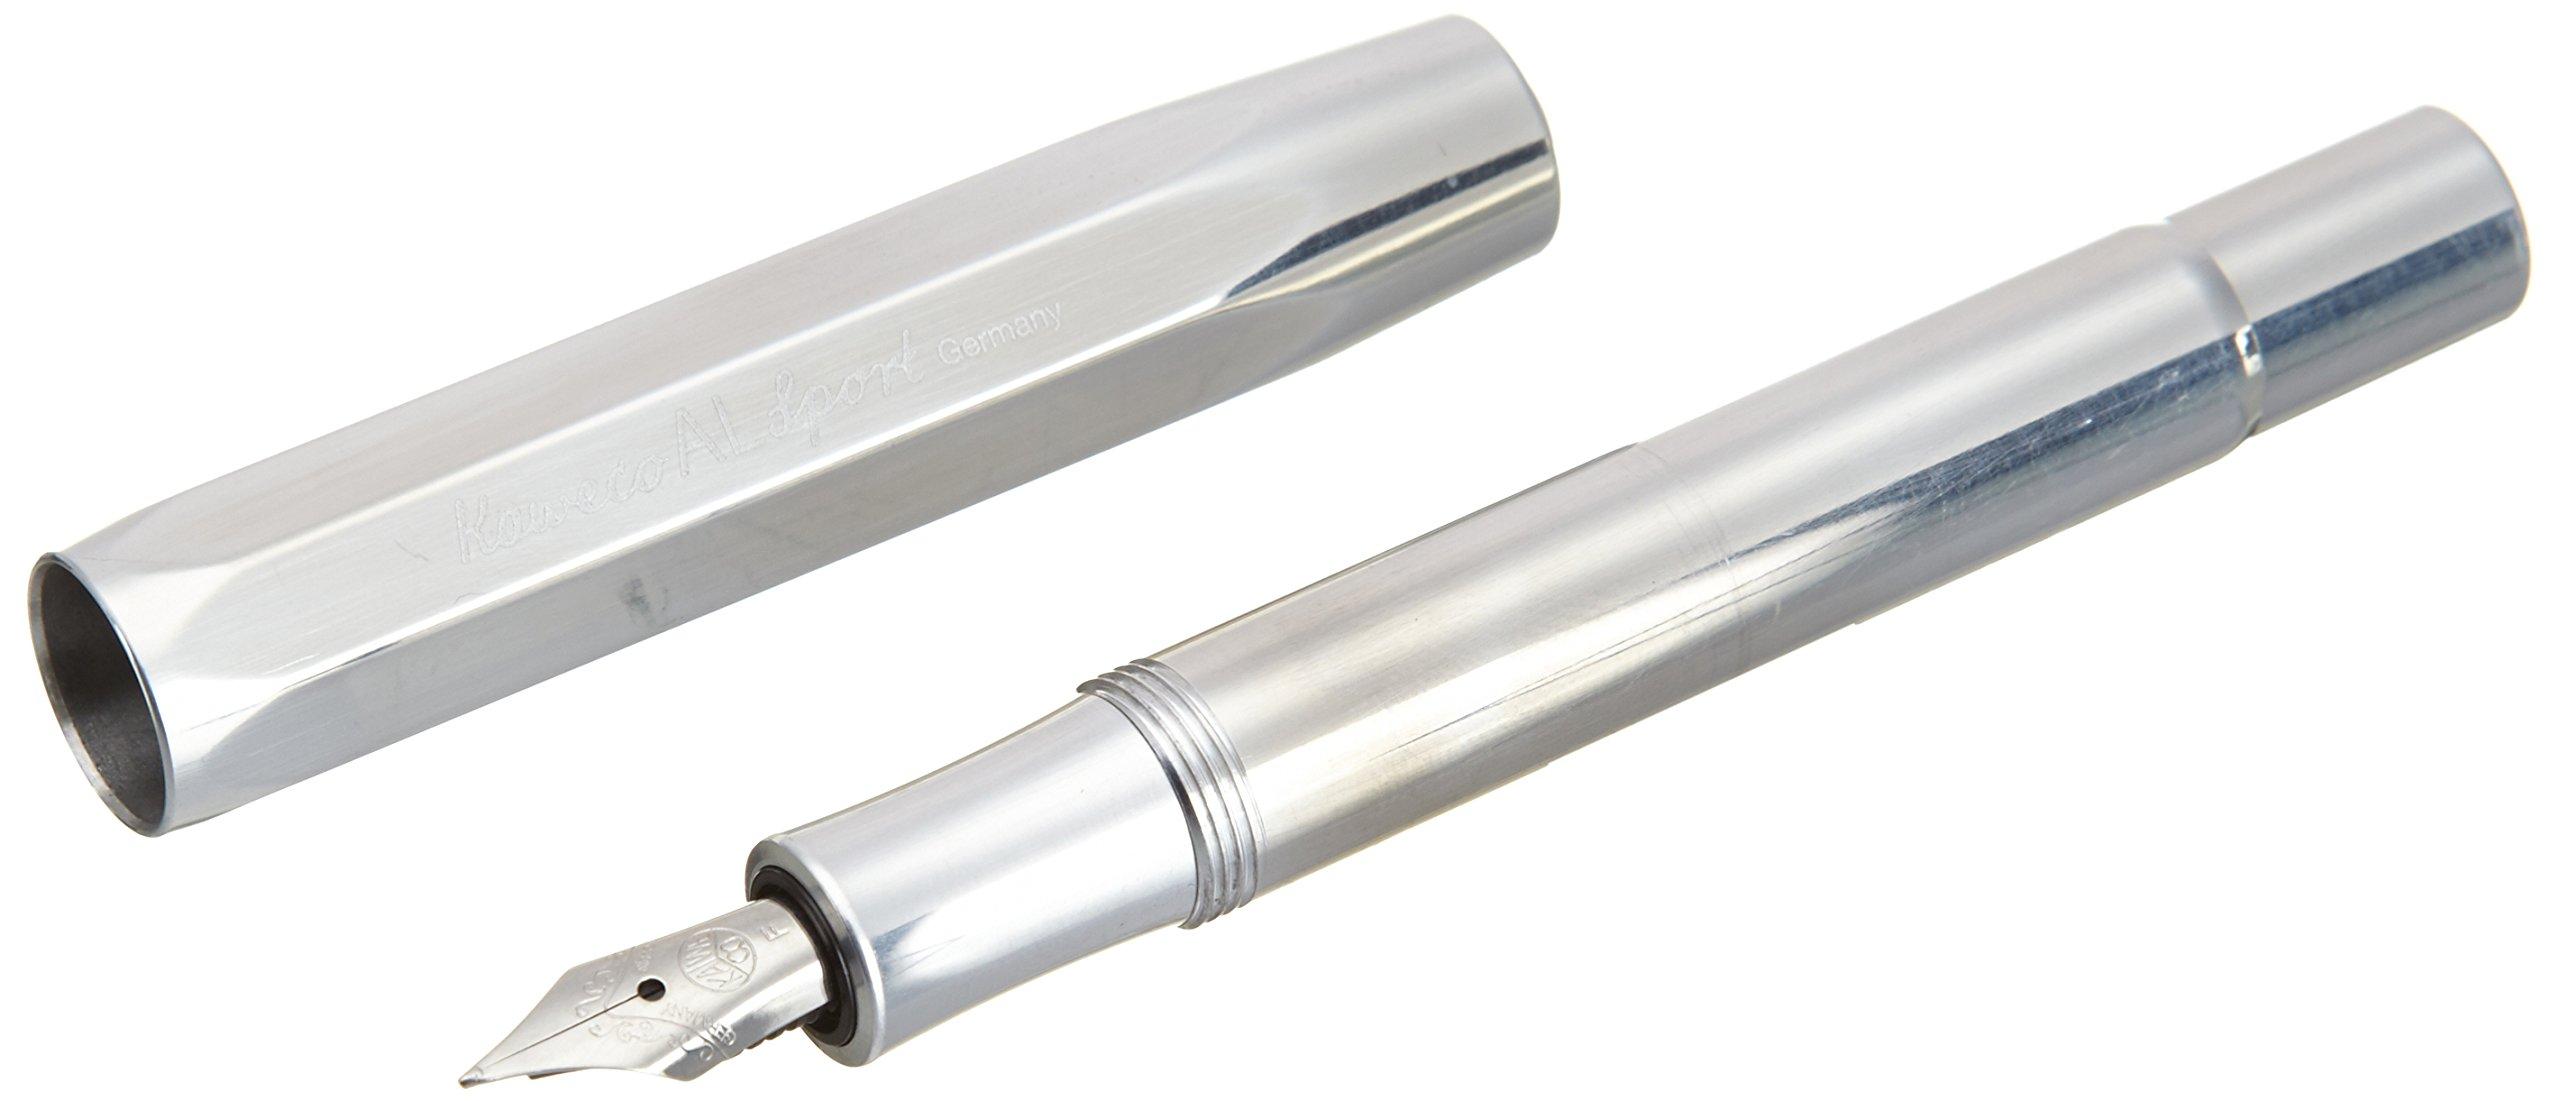 Kaweco AL Sport Fountain Pen, Raw Aluminum, Fine Nib by Kaweco